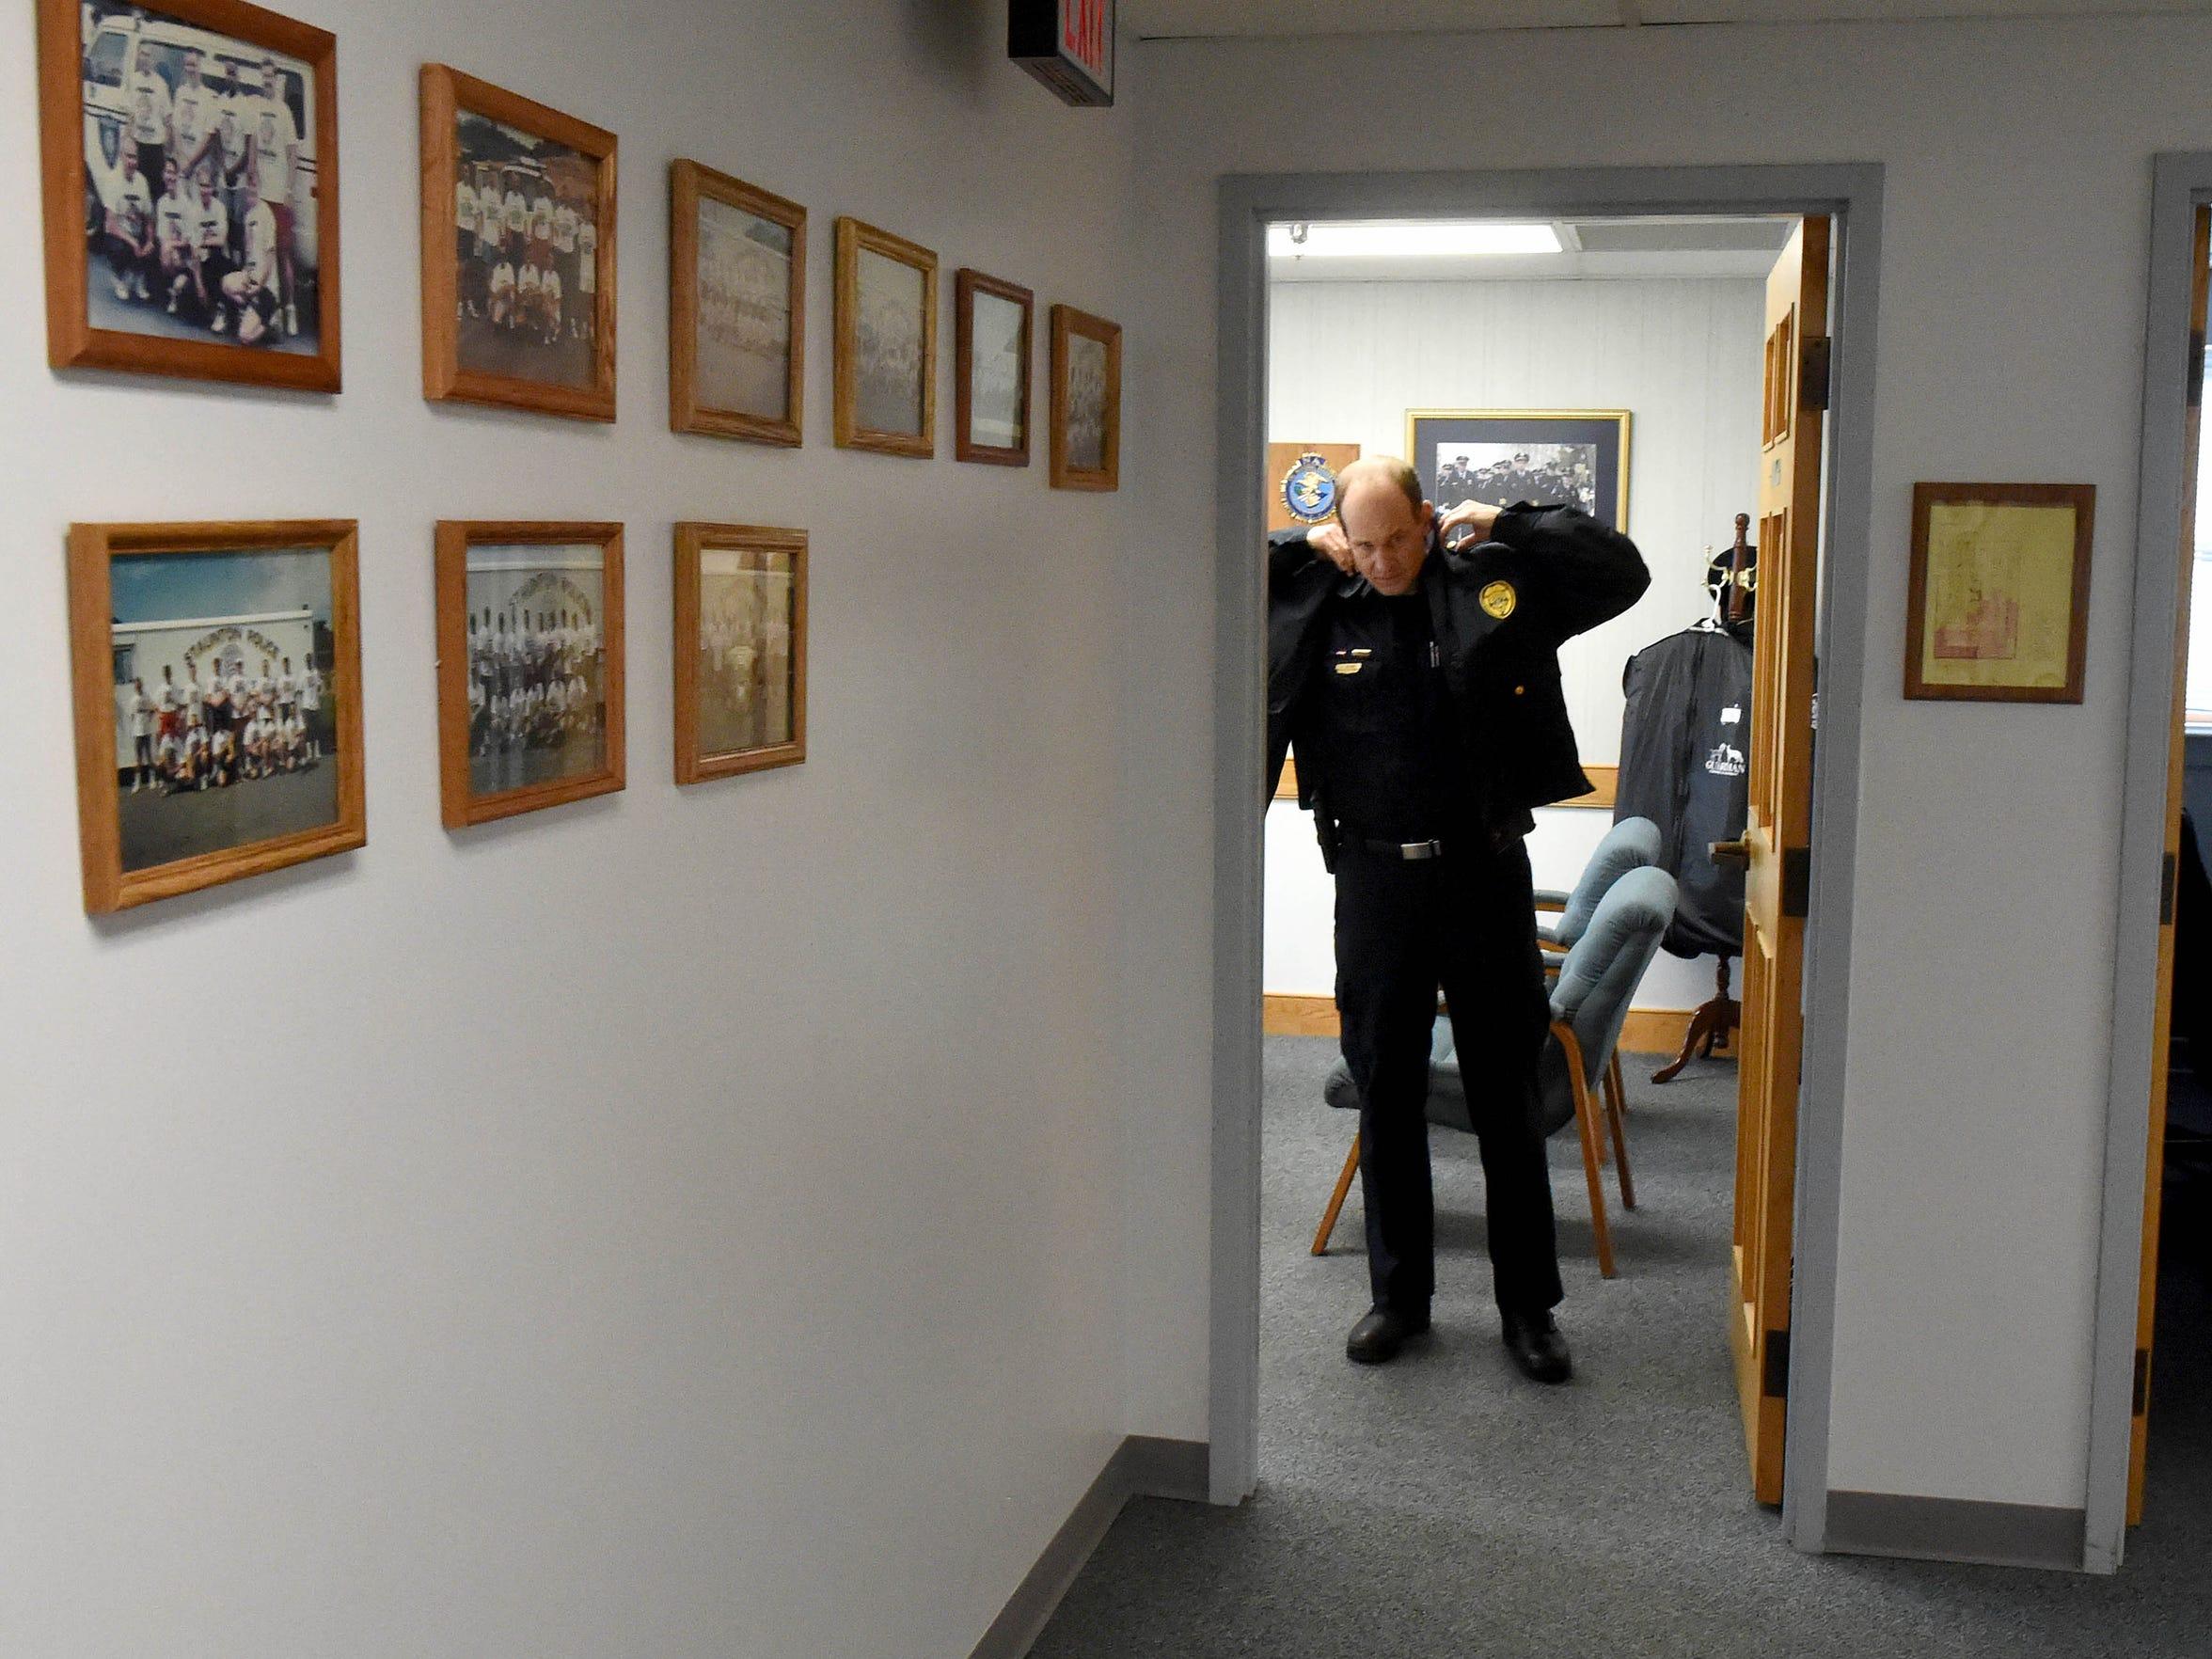 Chief Jim Williams of the Staunton Police Department